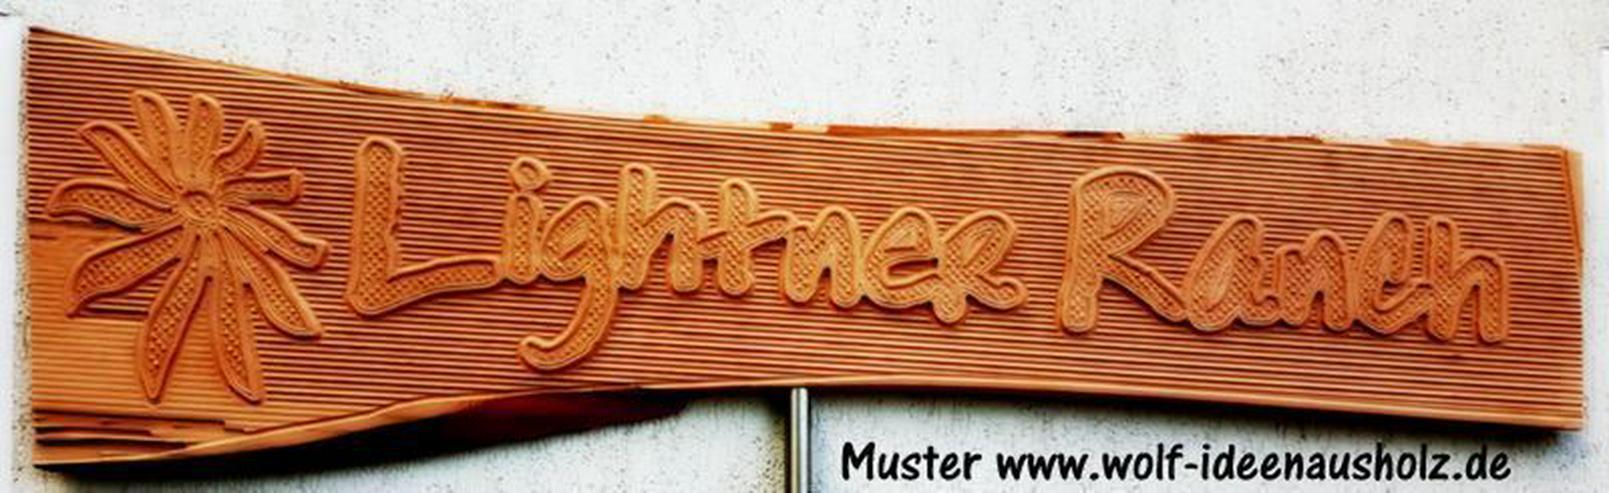 rustikale Holzschilder - Zäune & Tore - Bild 1